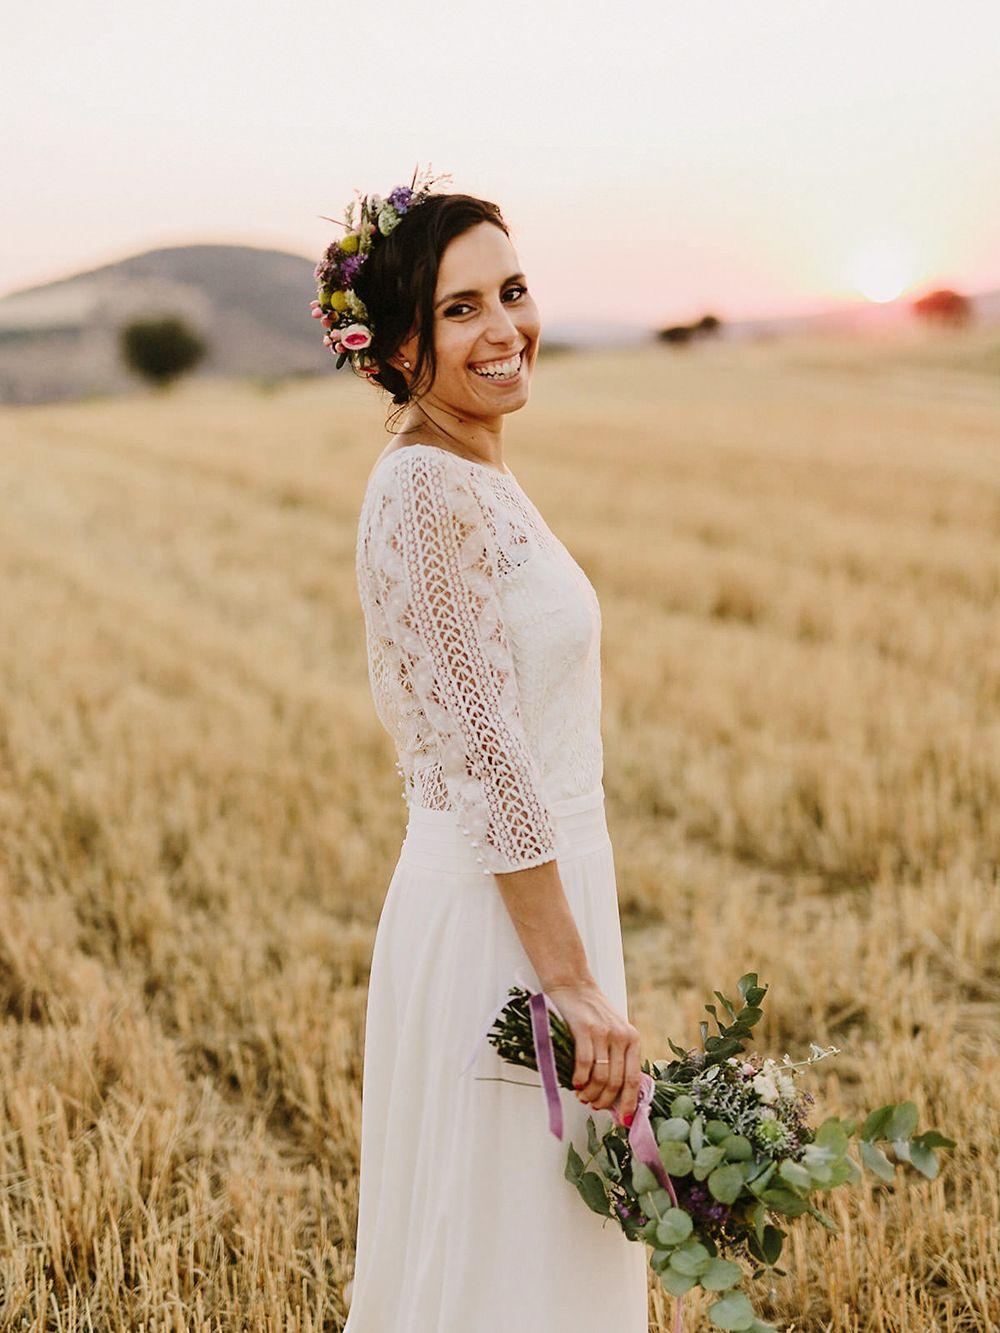 Laura de sagazan boho wedding dress with rachel simpson mimosa